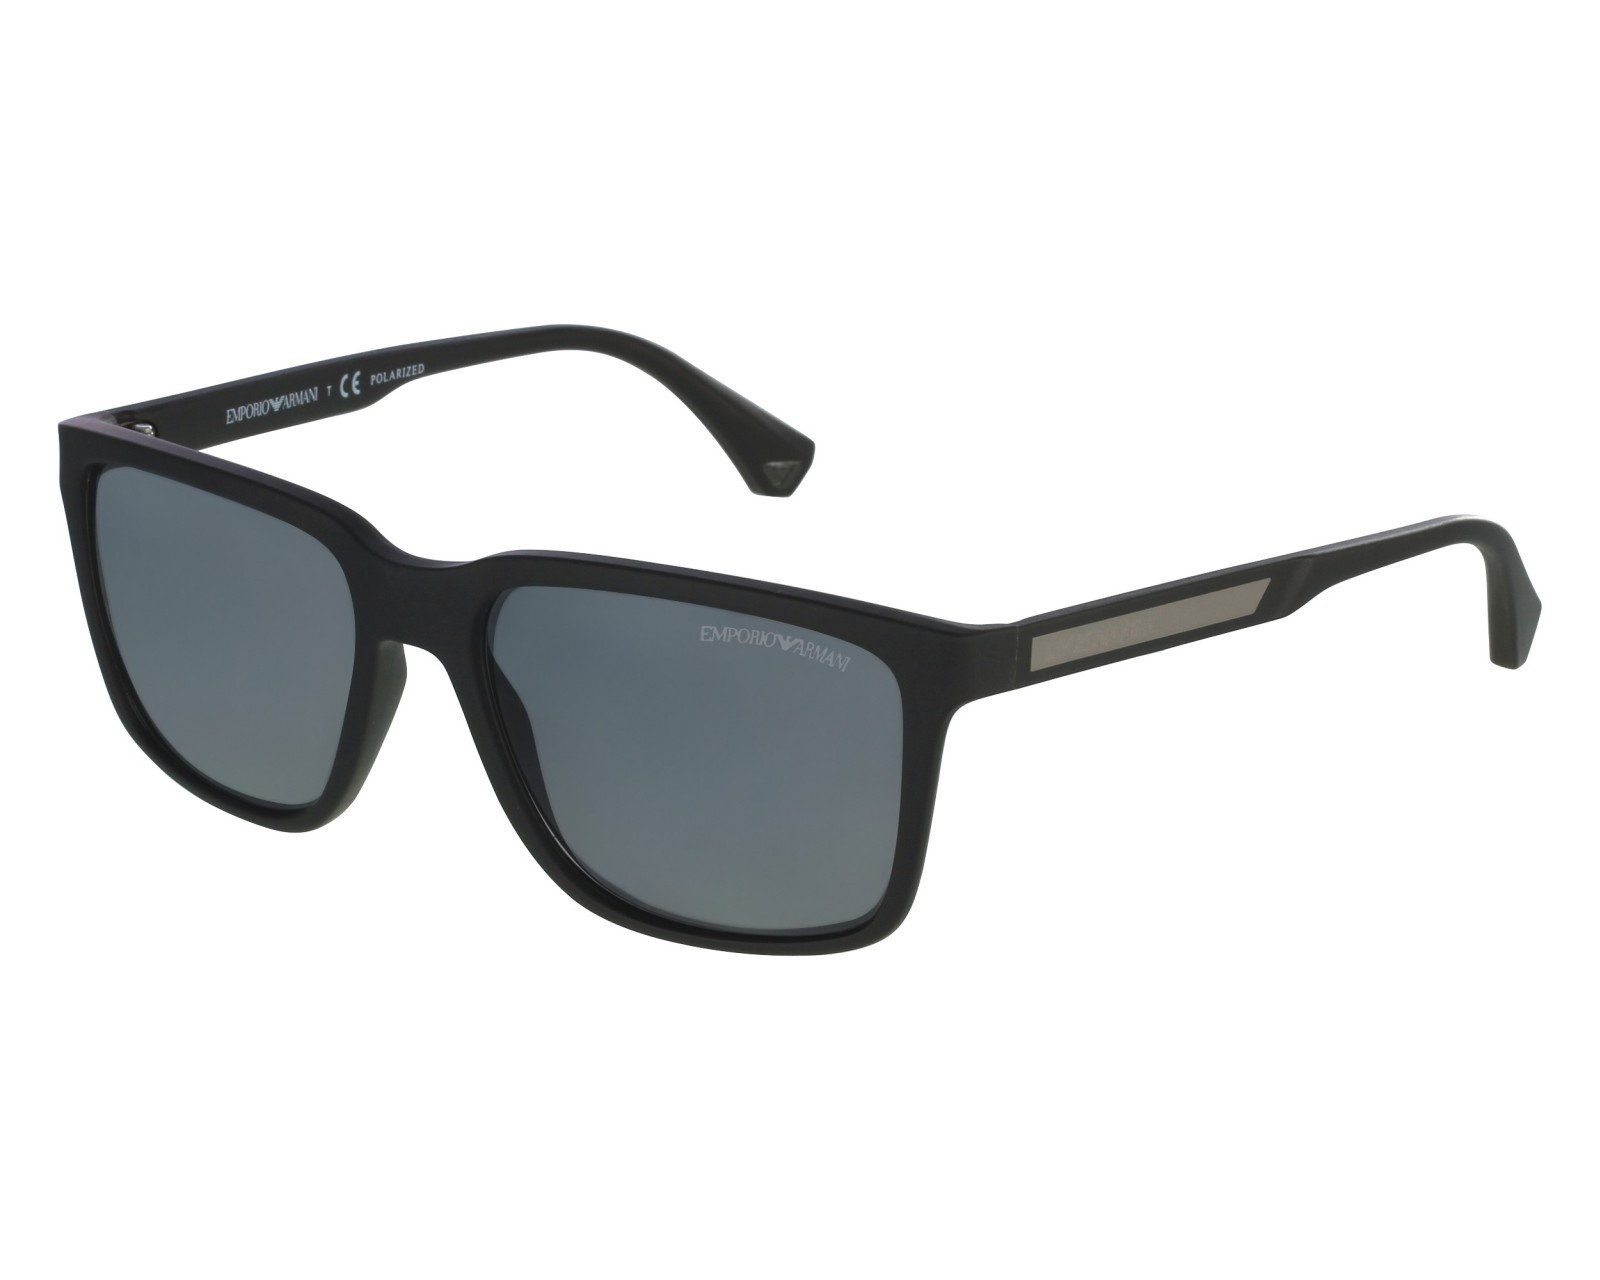 aaa7a7d46 Gafas de sol Emporio Armani EA-4047 5063/81 - Negra vista de frente